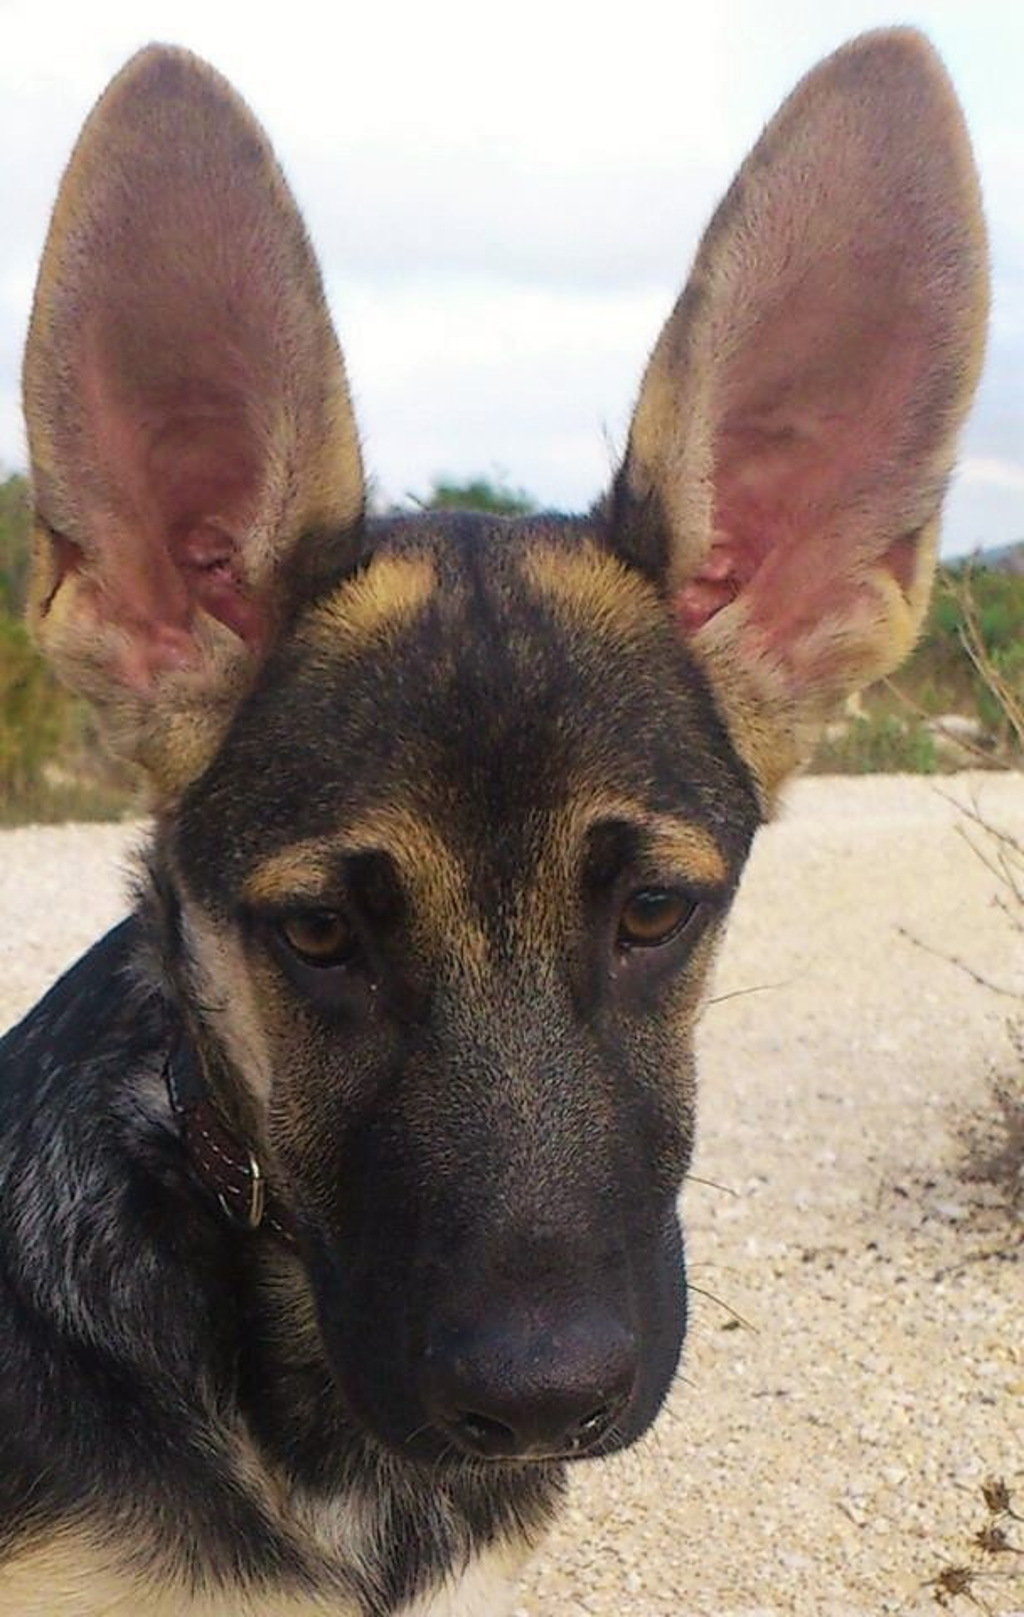 Roo's ears by rubyshepherd